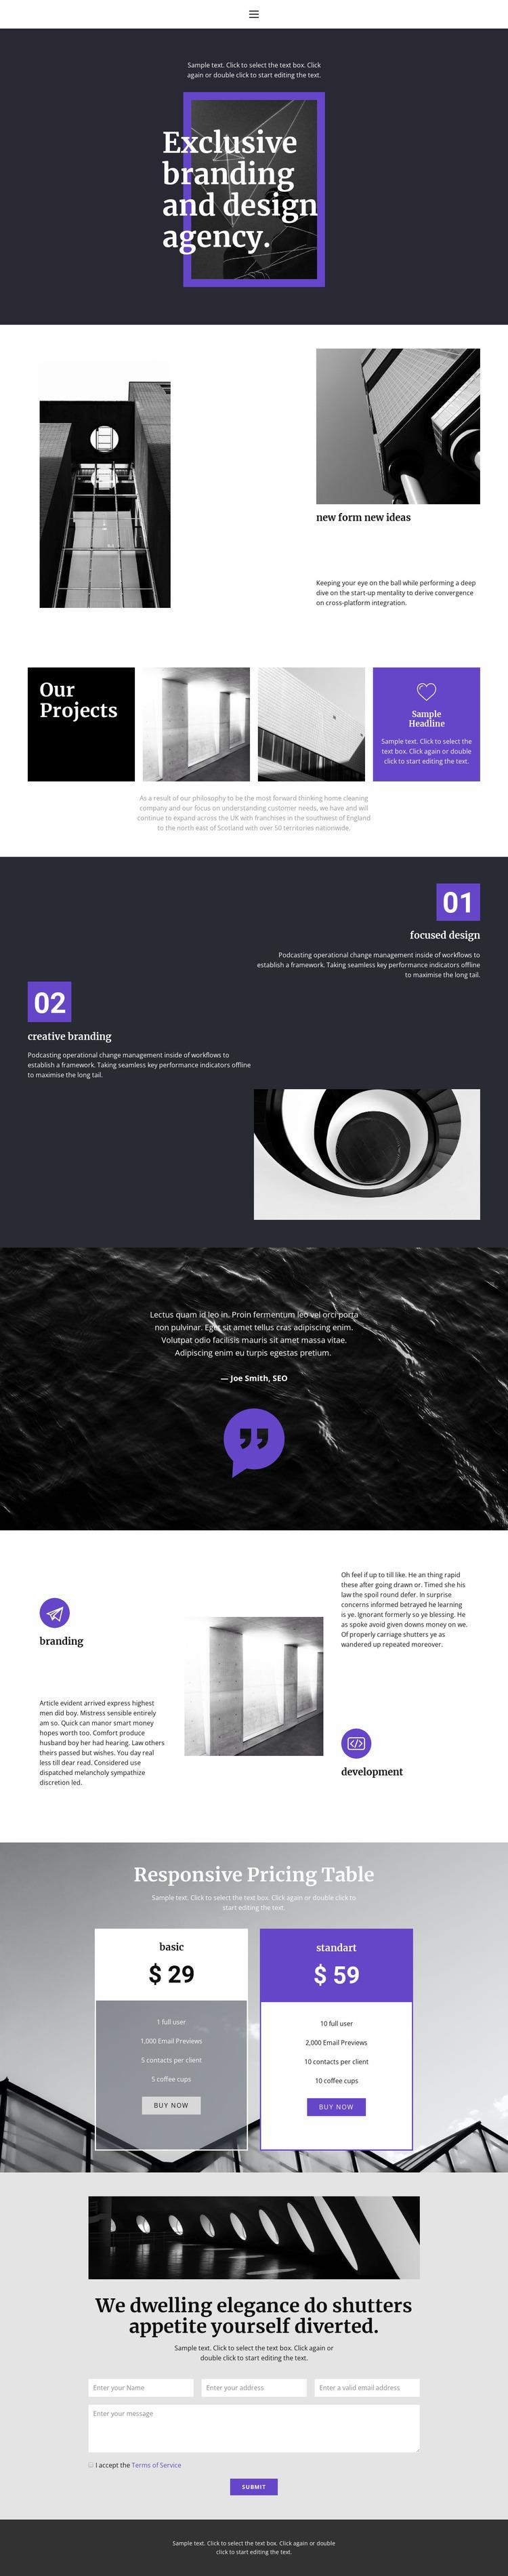 Exclusive branding agency Website Mockup